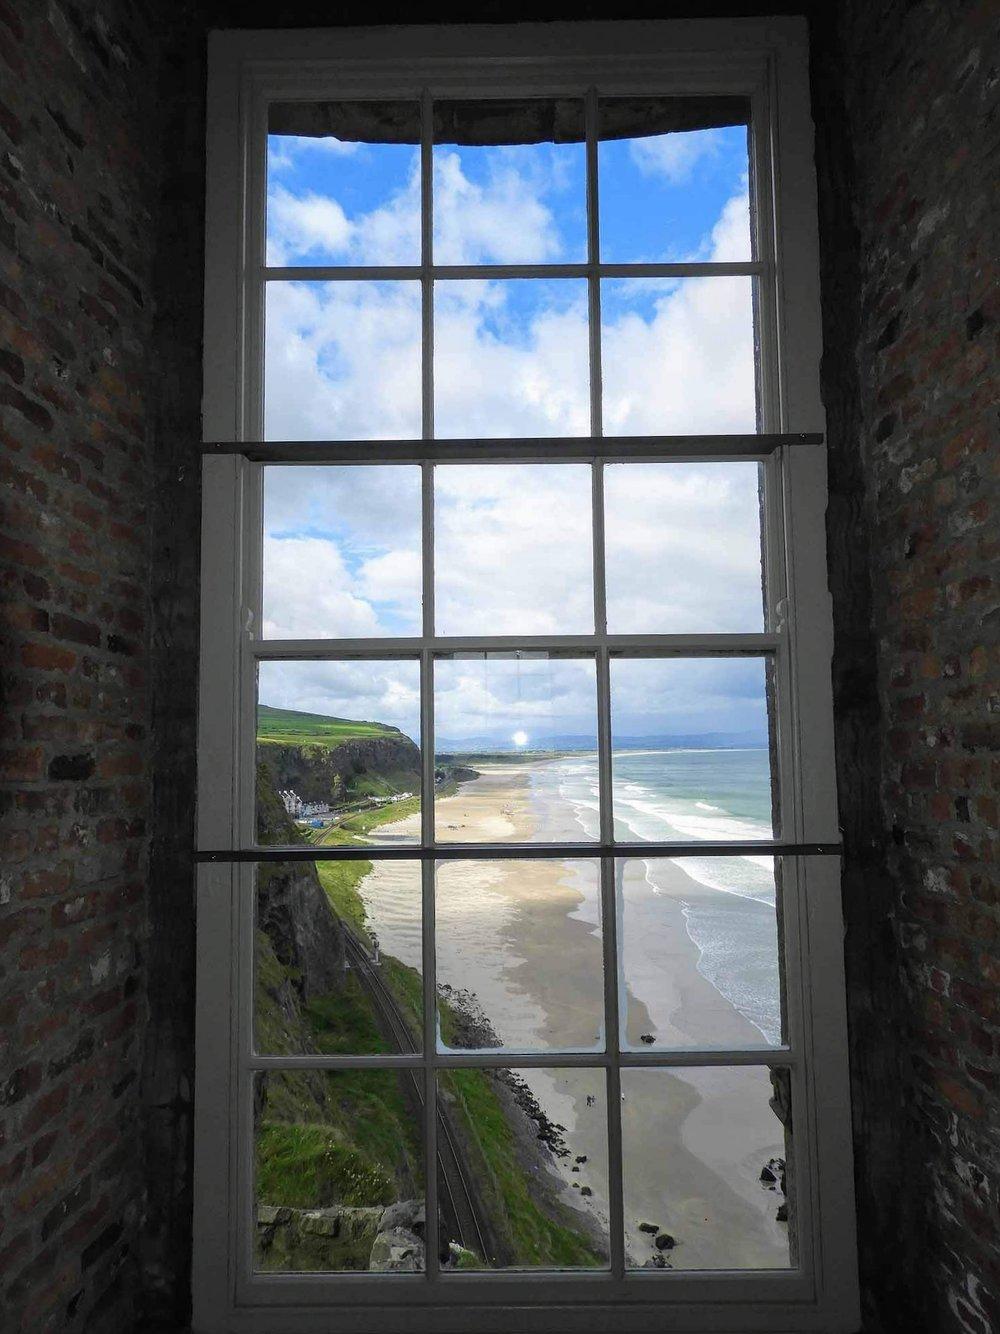 northern-ireland-coast-downhill-demesne-national-trust-window-view.jpg